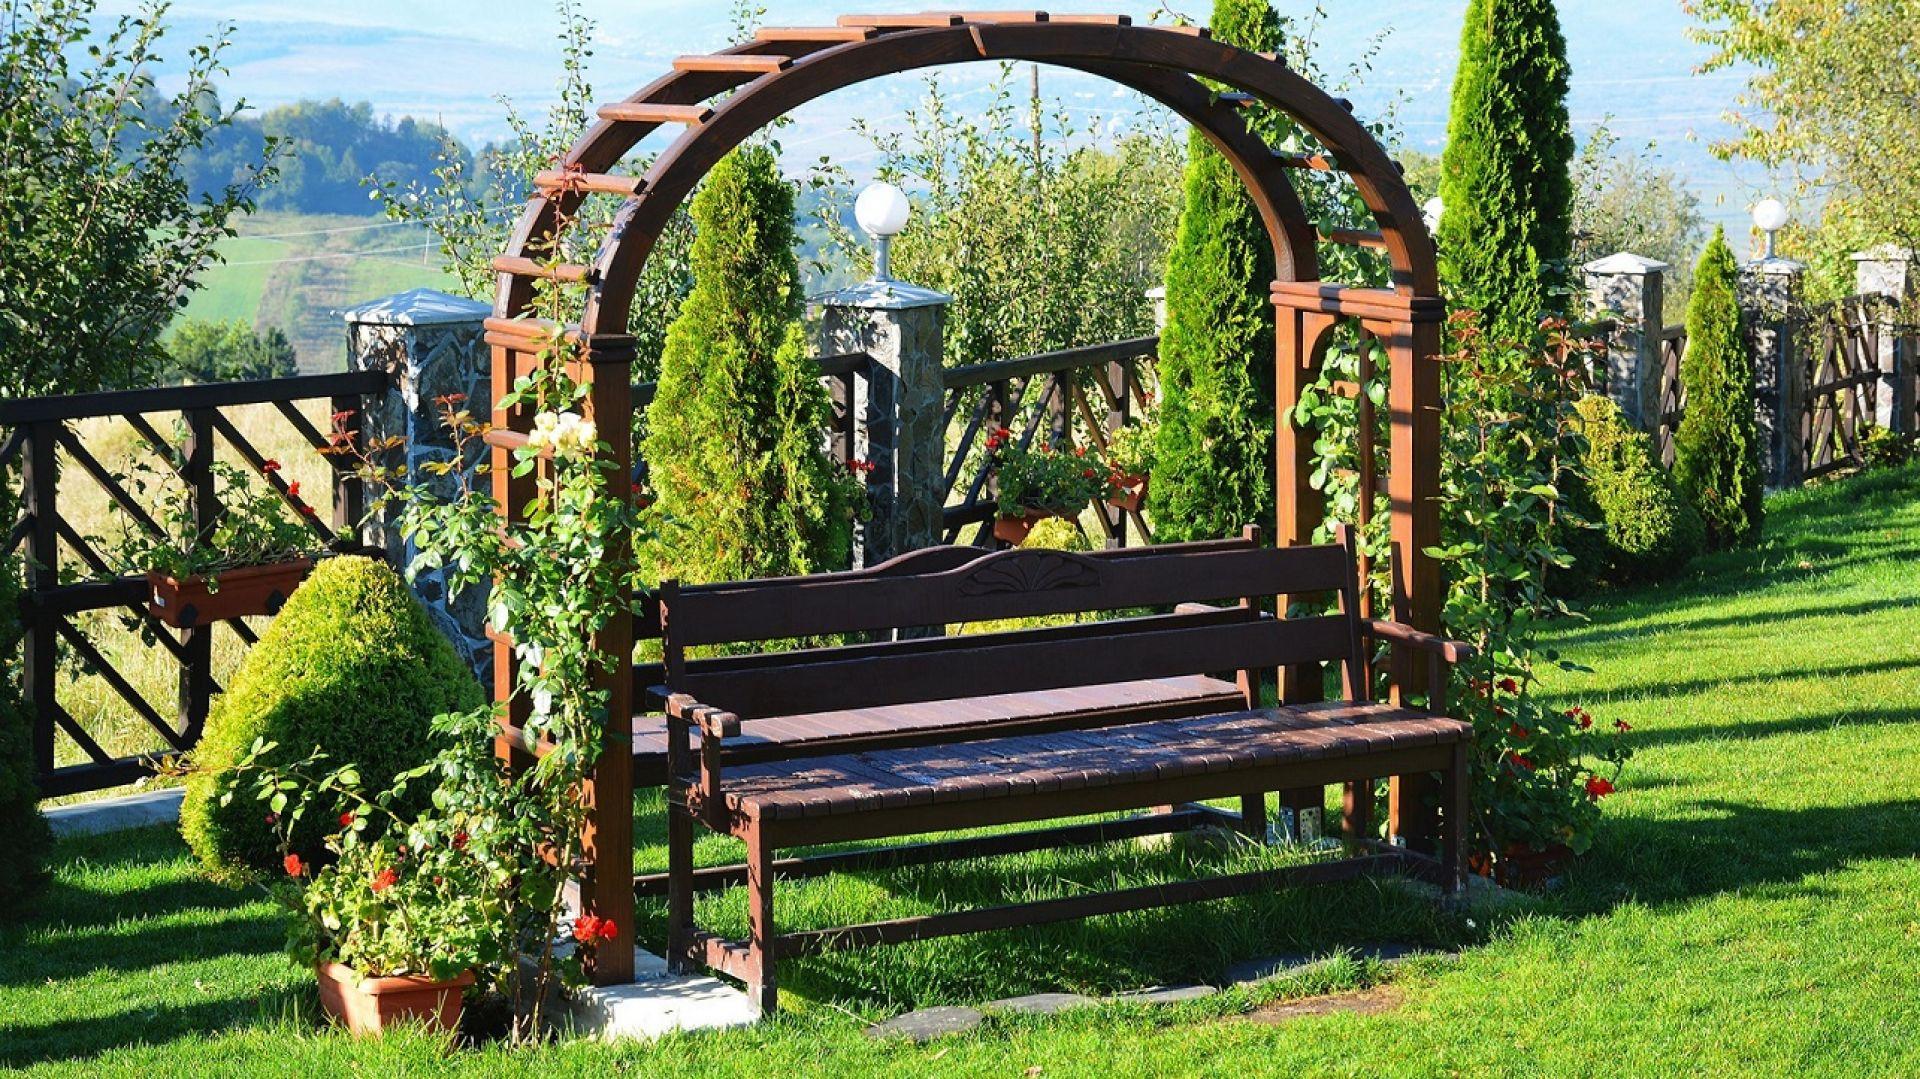 Drewniane meble ogrodowe: pergola i ławka. Fot. Vidaron